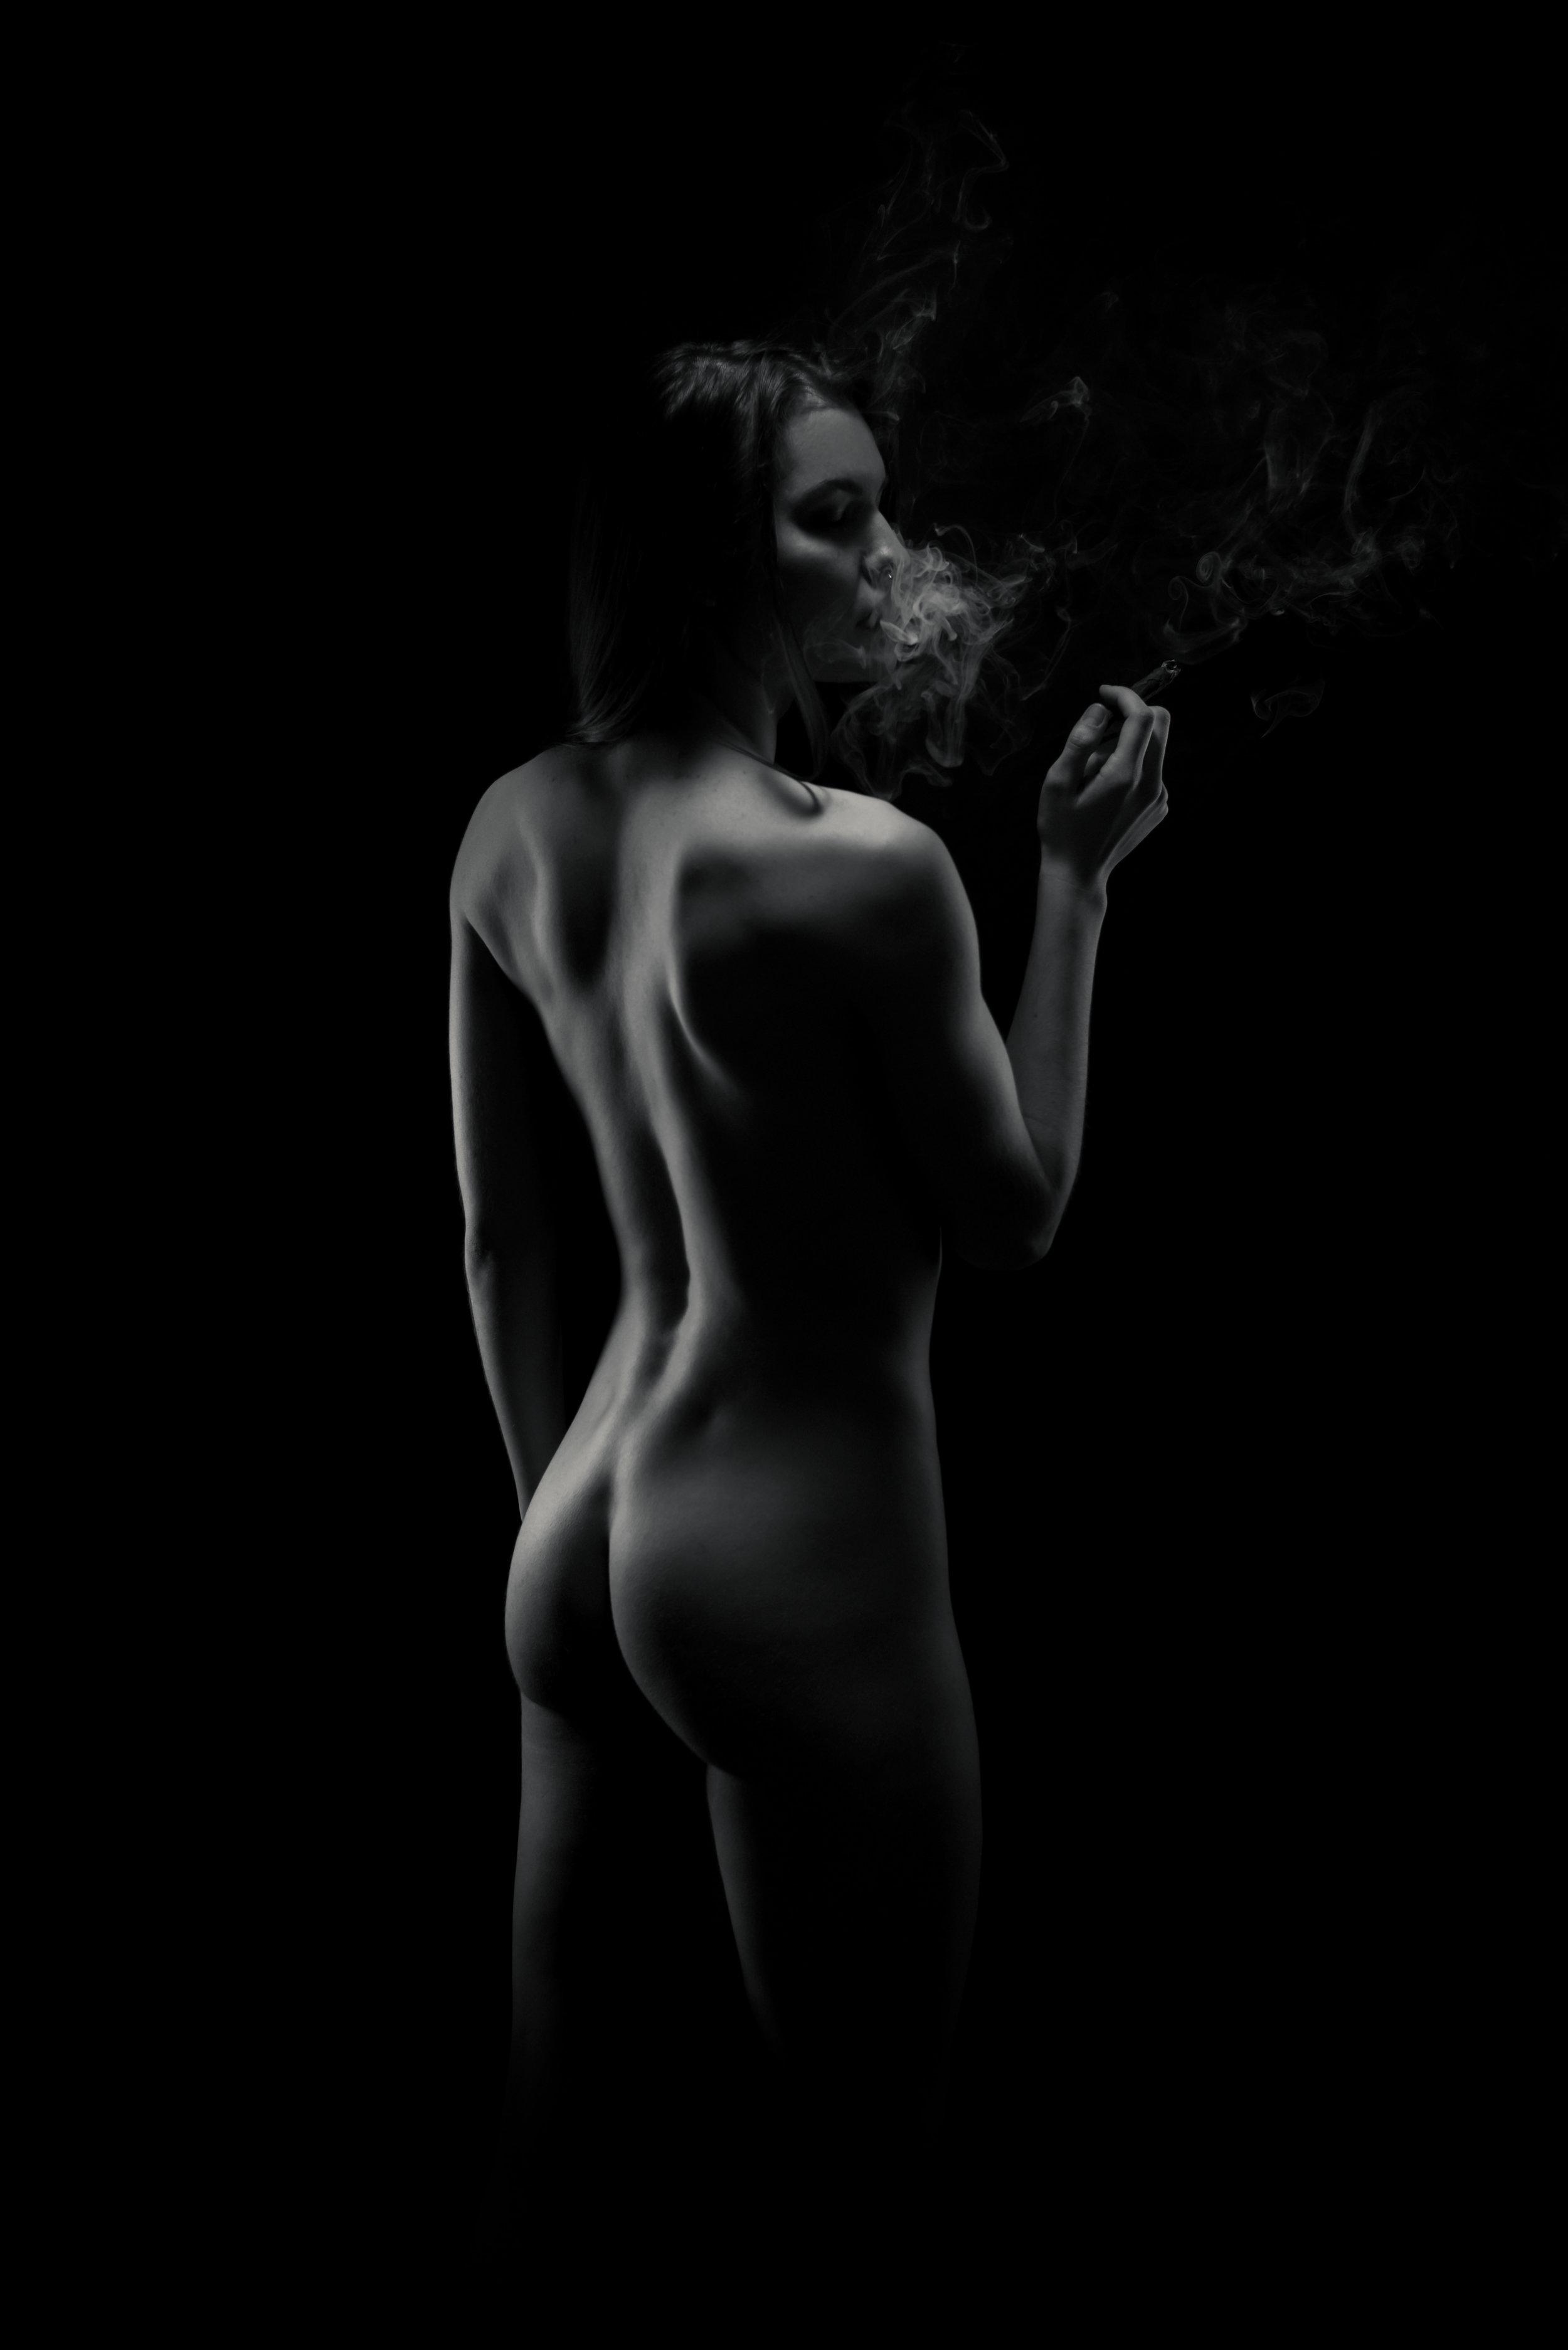 Rachel R - Smoking 2.jpg